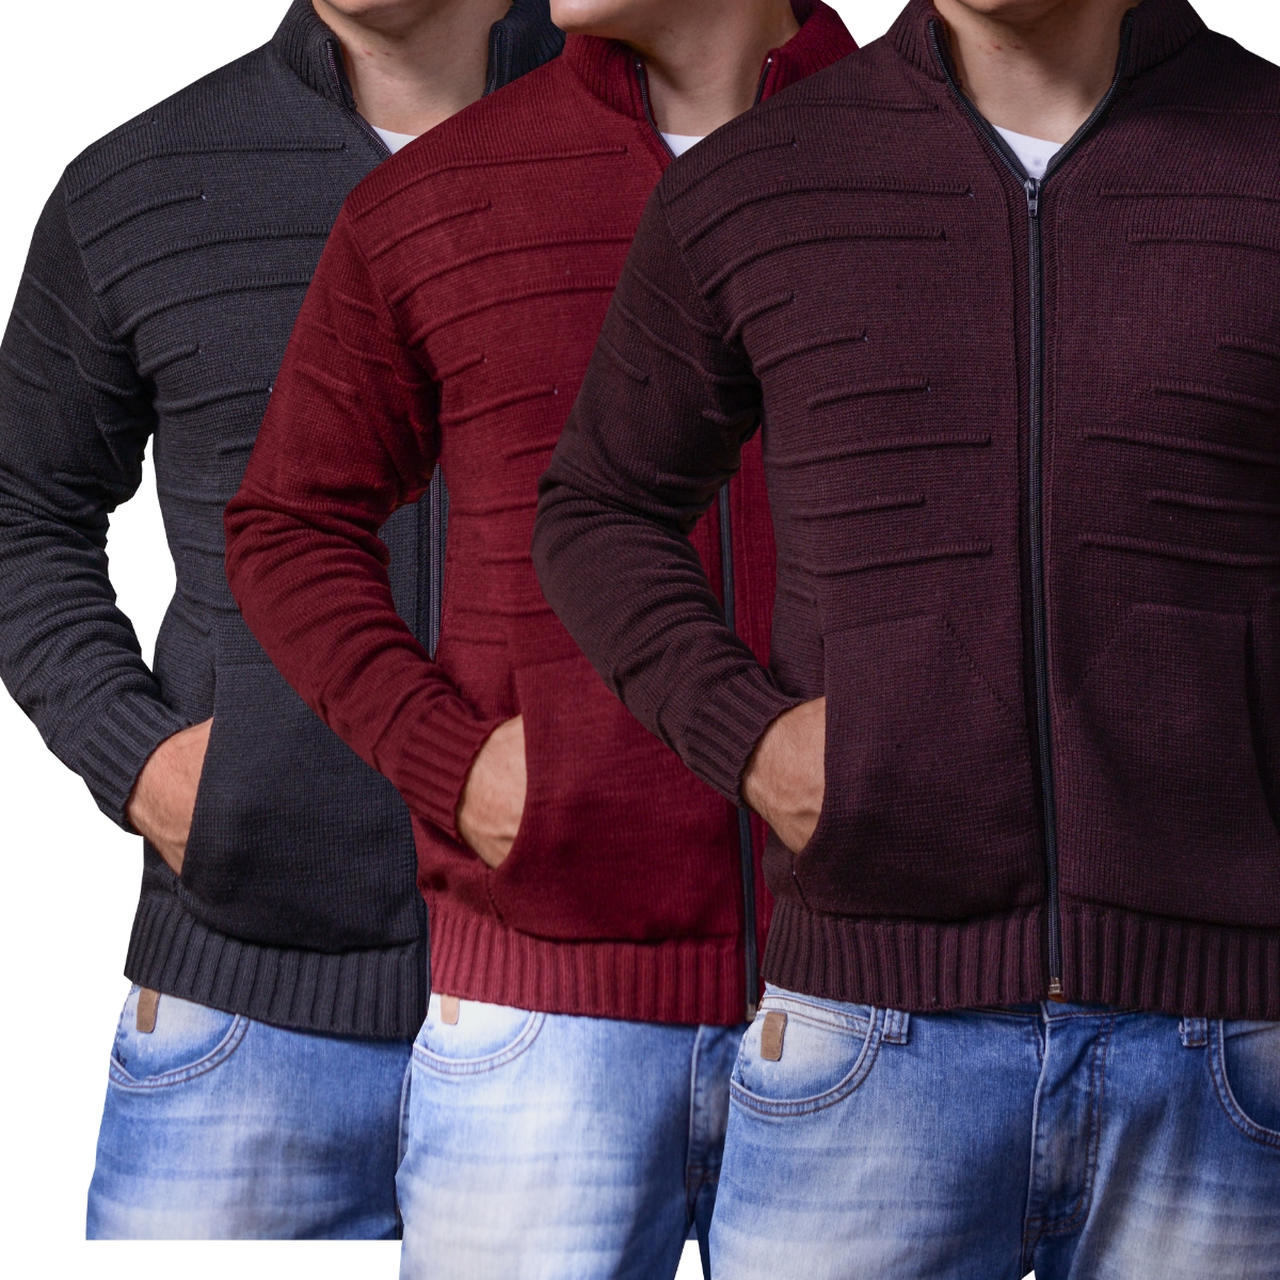 jaqueta térmica kit 3 blusas masculina de trico frio intenso